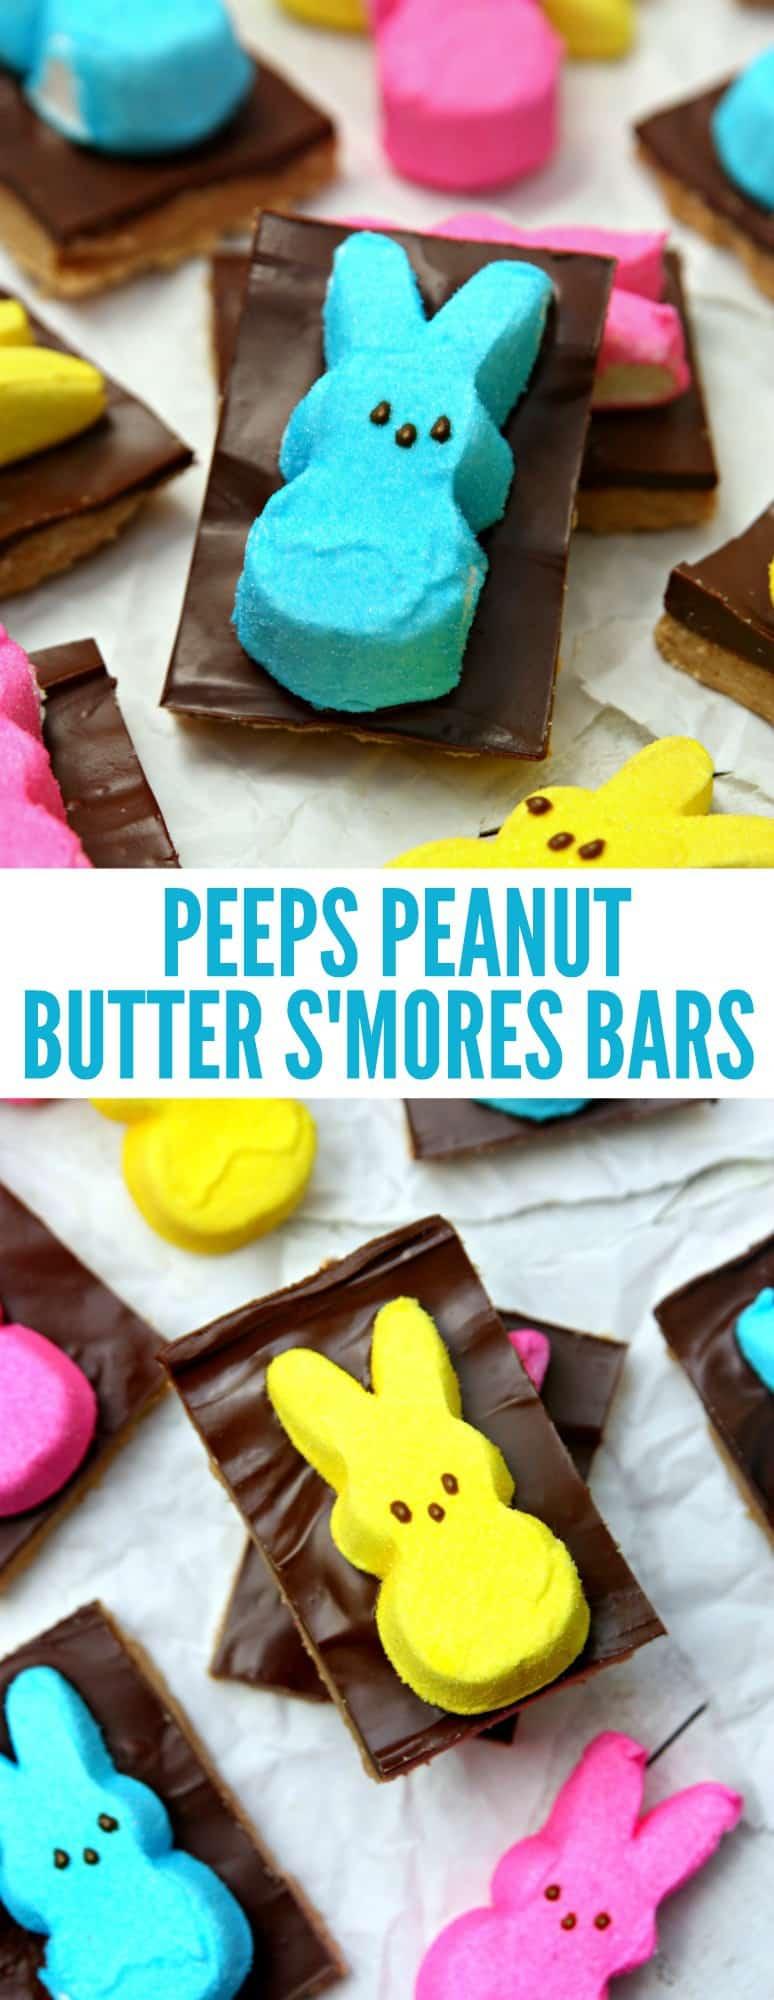 PEEPS Peanut Butter S'mores Bars